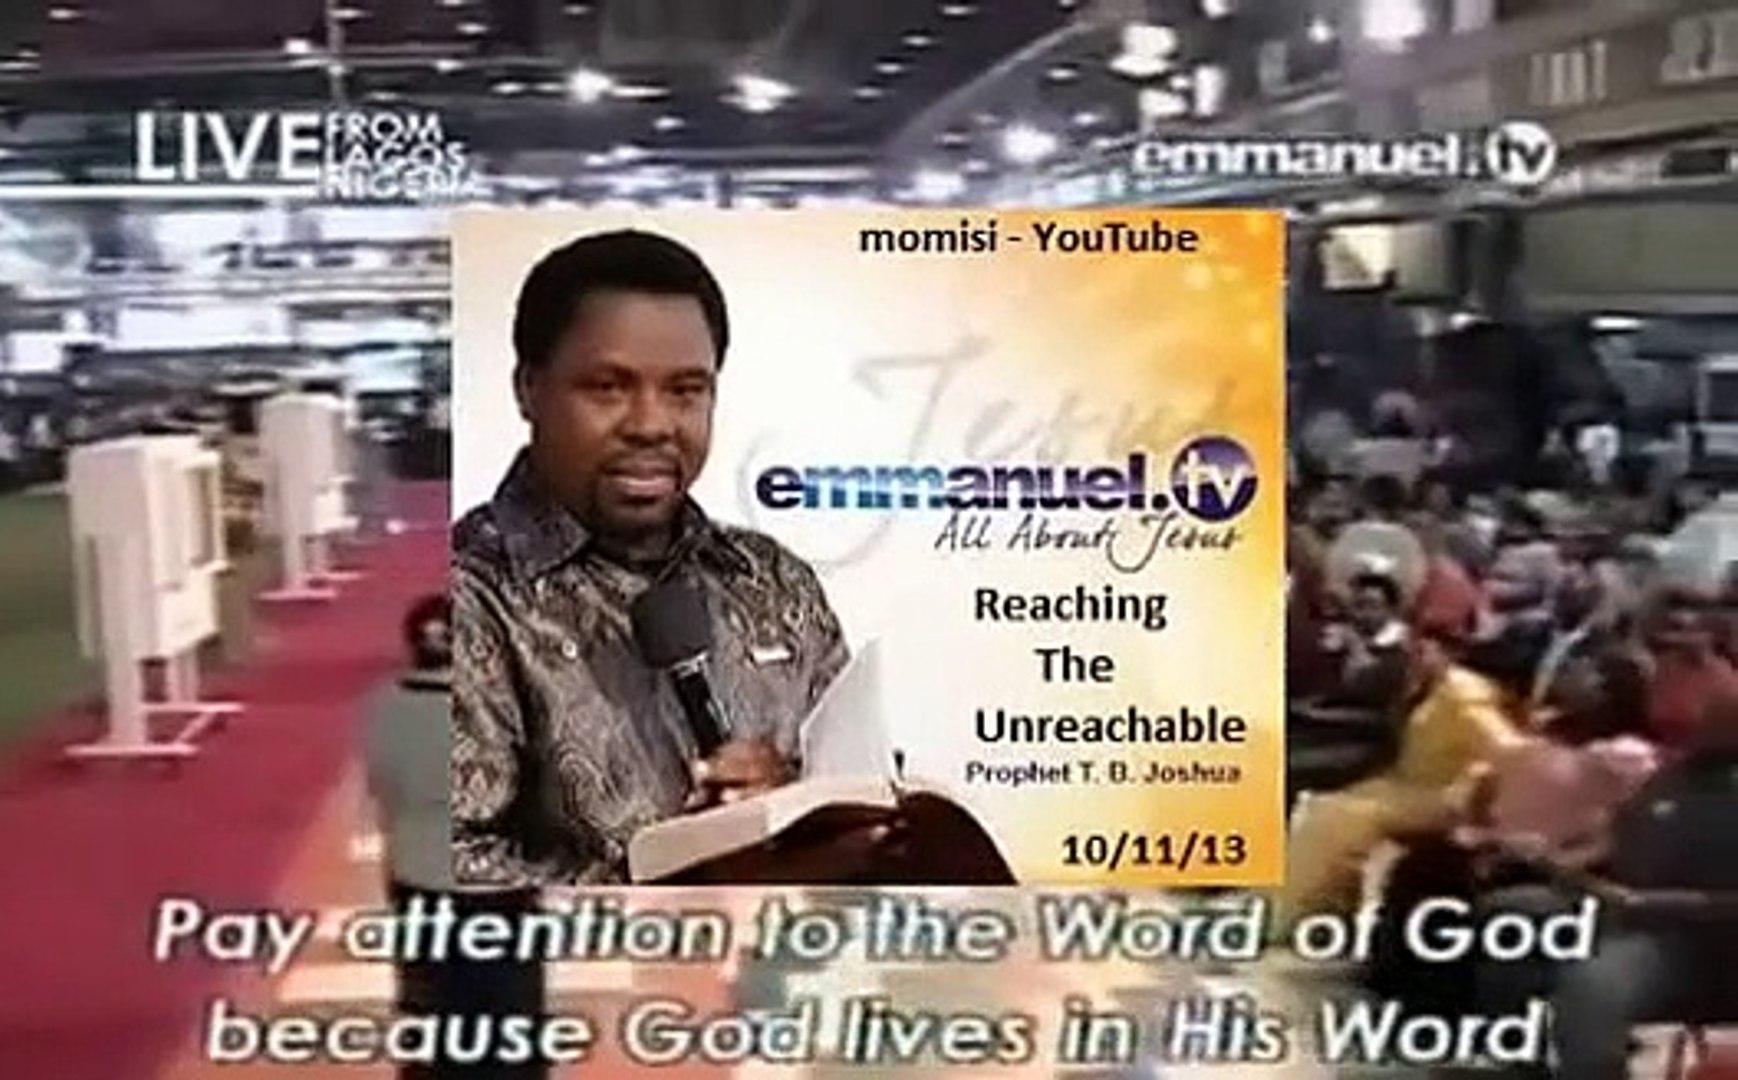 Evelyn Joshua: Reaching the Unreachable Sunday 10 Nov 13 Emmanuel TV SCOAN  Prophet TB Joshua's Wife